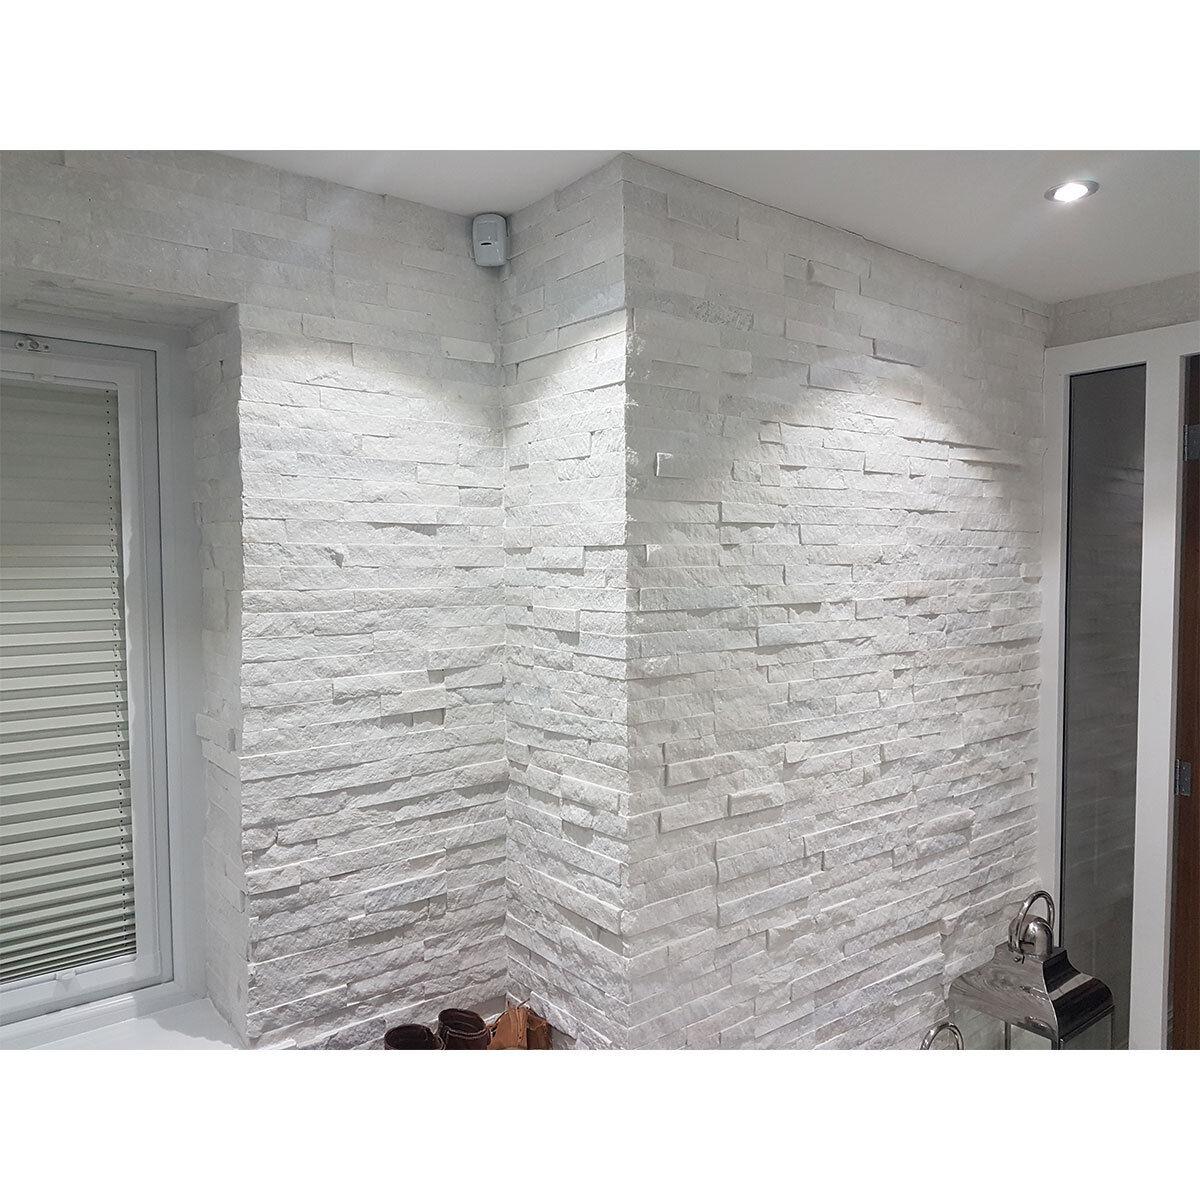 Split Face White Quartz Natural Stone Cladding Mosaic Wall Tiles 10m2 Deal